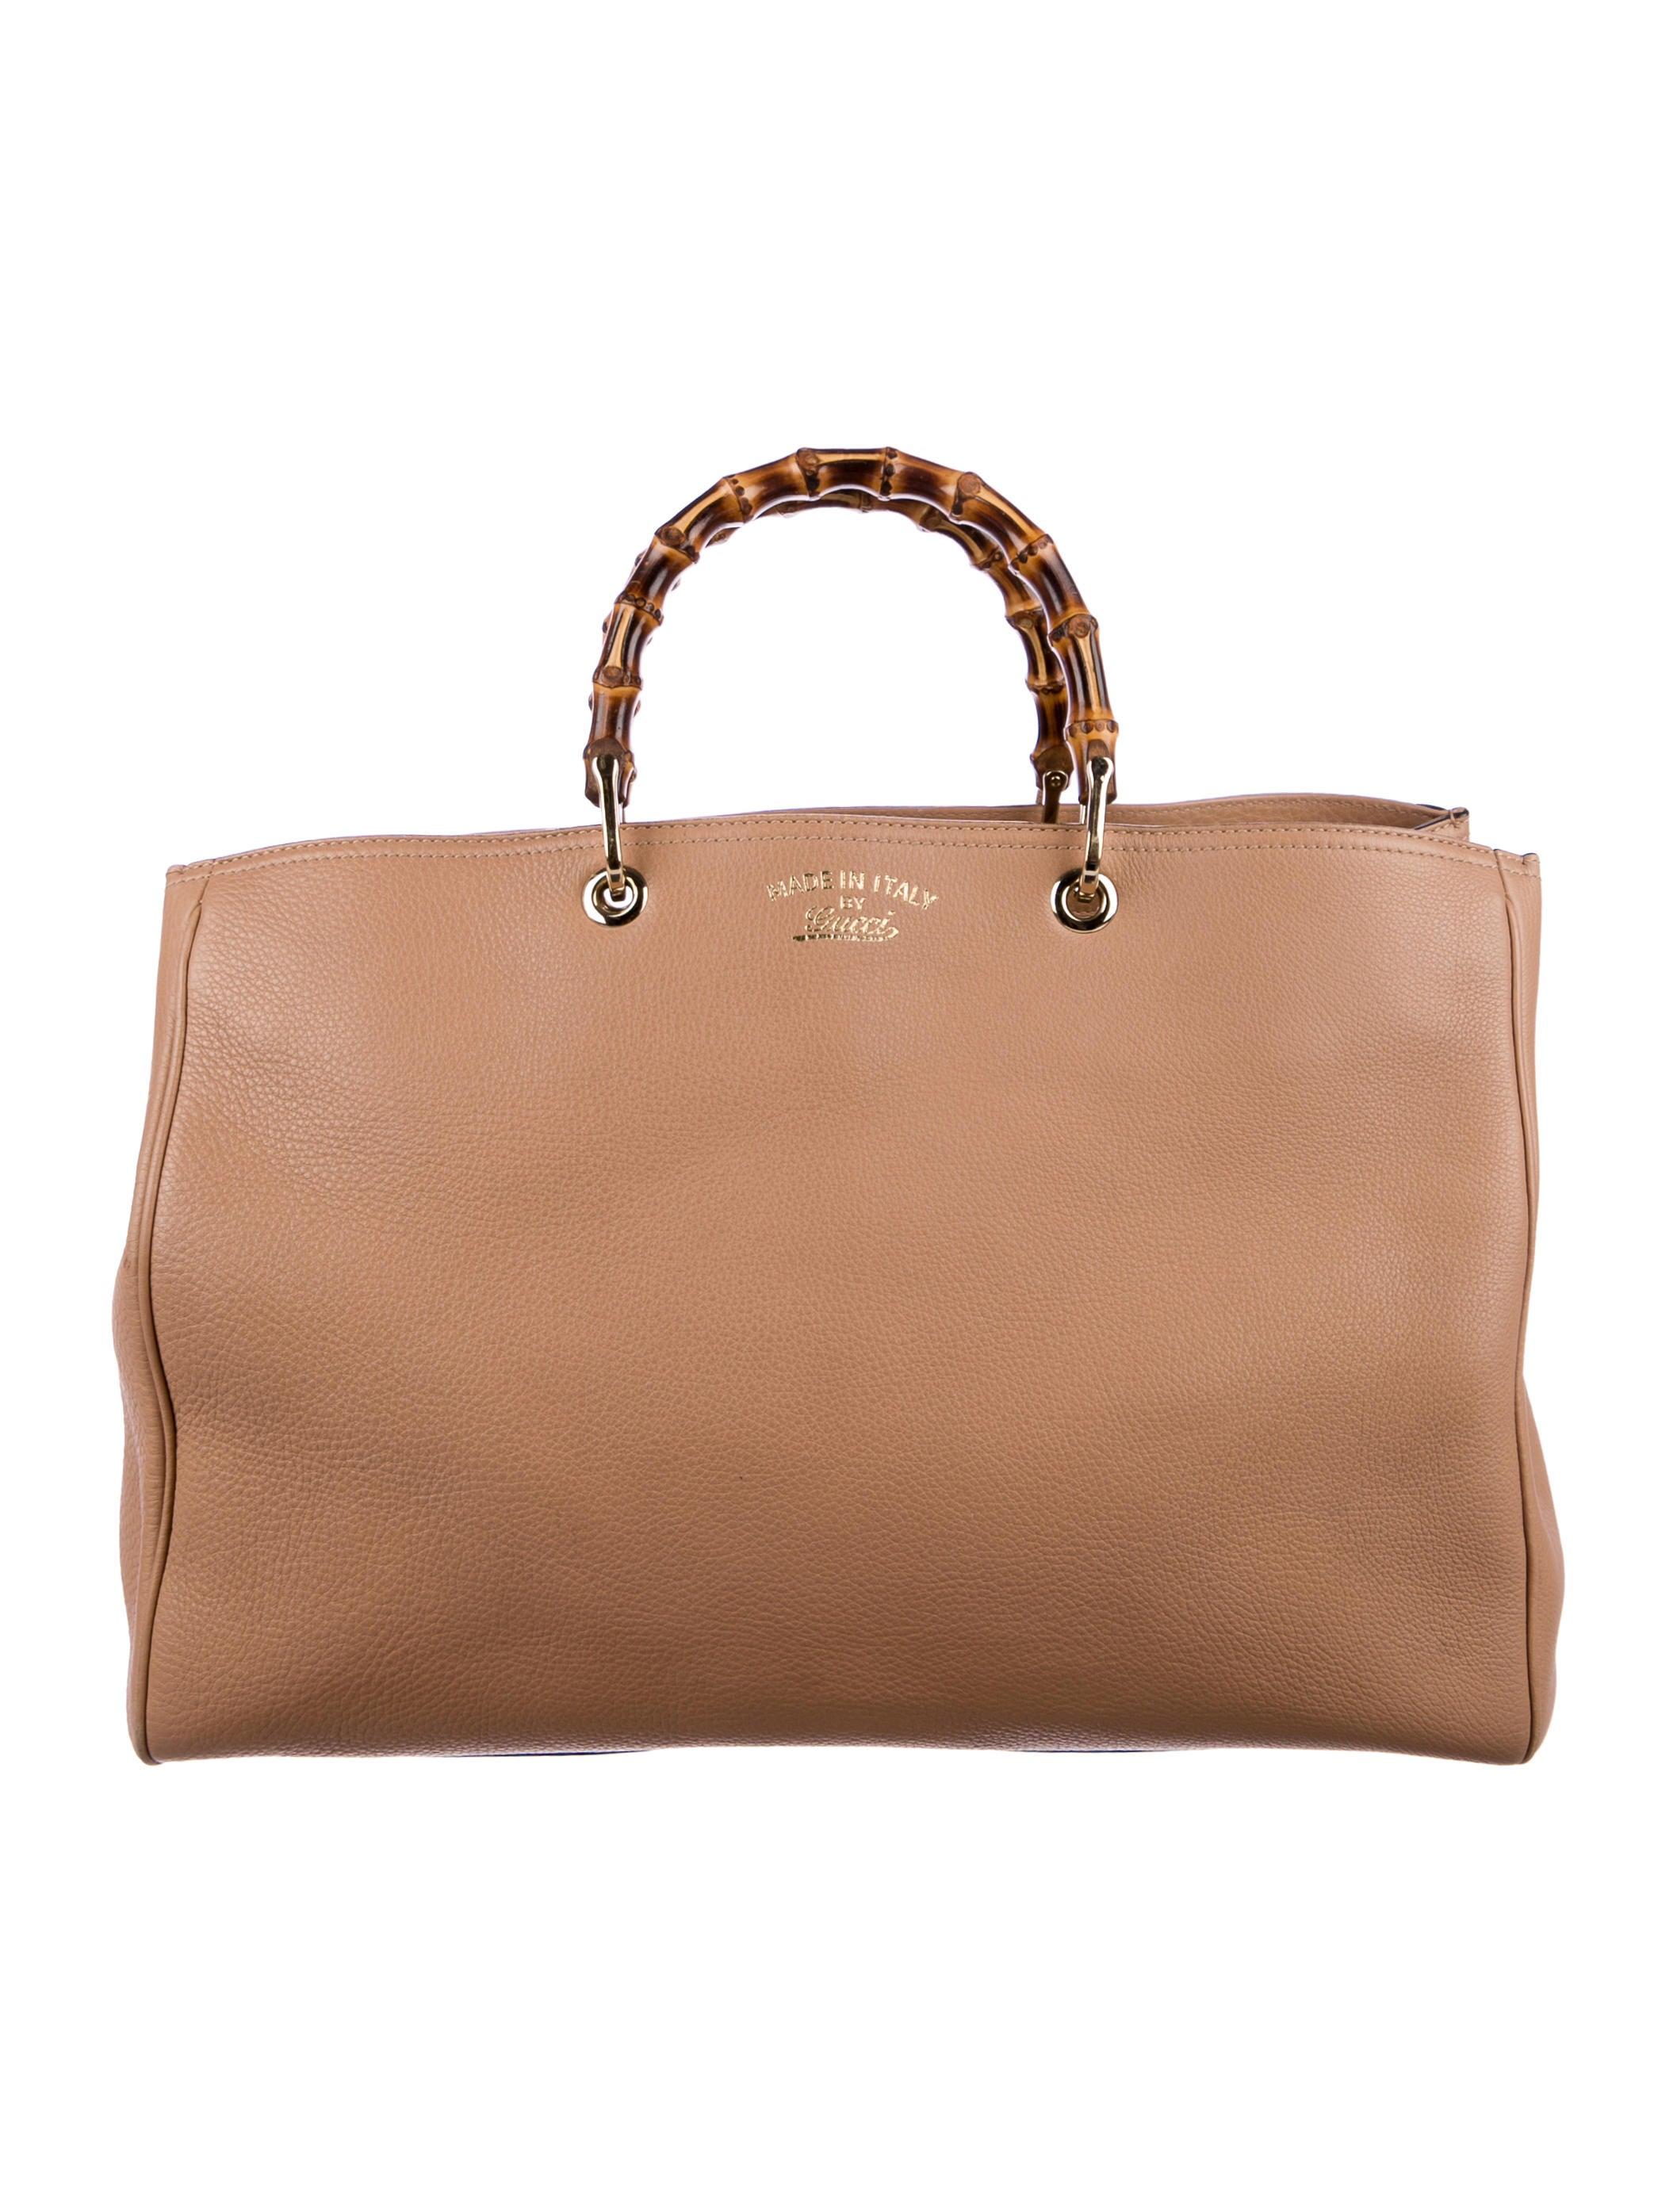 gucci bamboo shopper tote handbags guc170010 the realreal. Black Bedroom Furniture Sets. Home Design Ideas